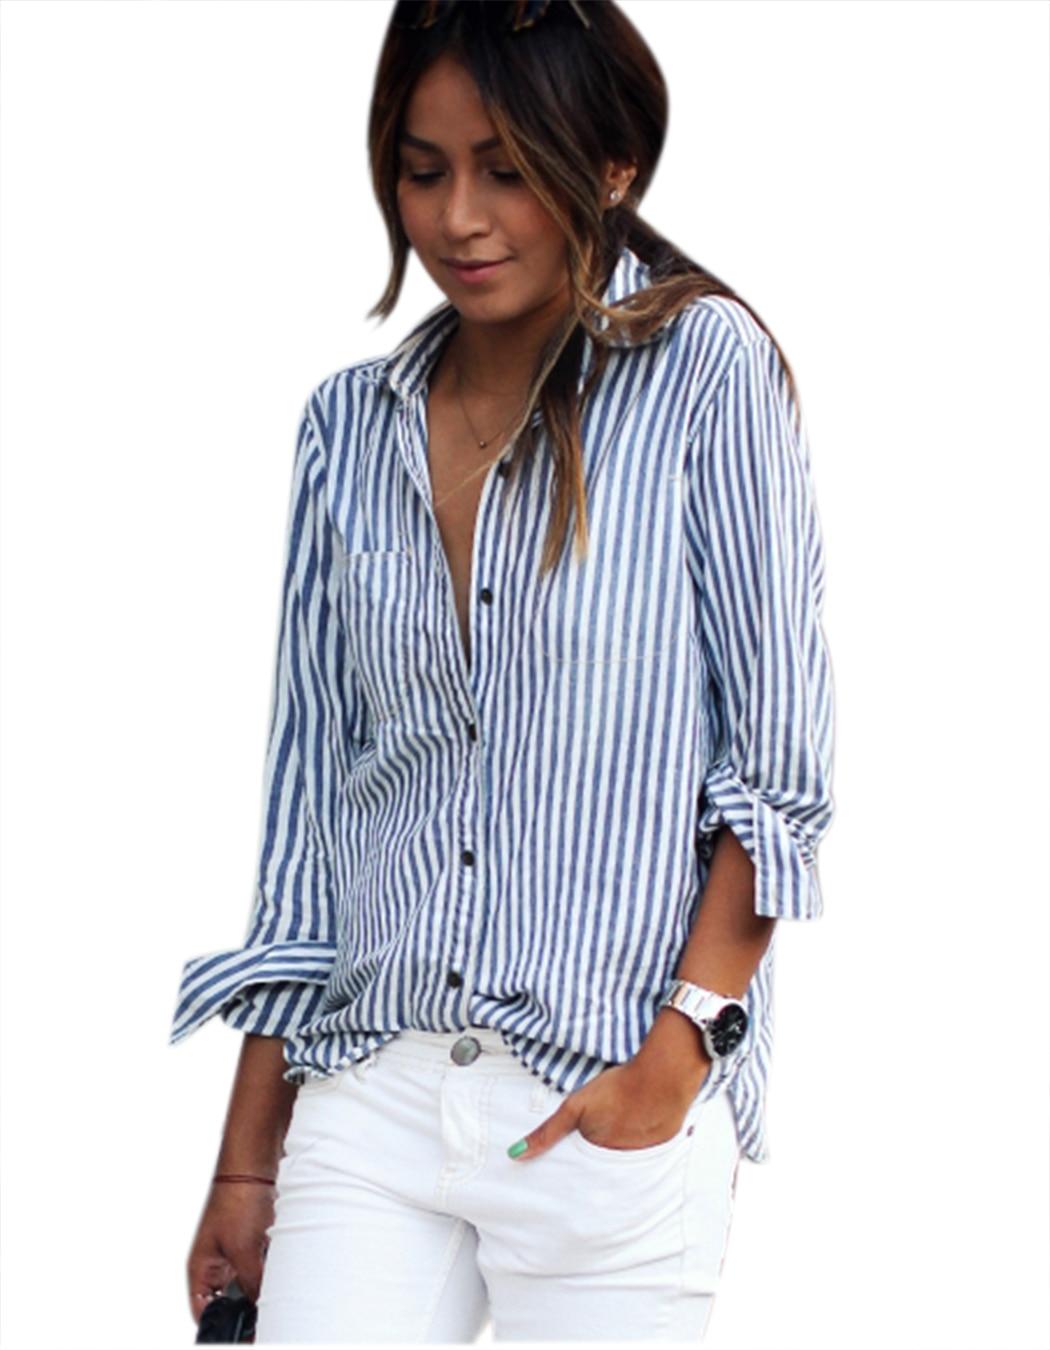 f3fb22a35c31 € 9.86 |Camisas de otoño Blusas de mujer Blusas femeninas 2018 de oficina  Blusa de manga larga a rayas camisa de Mujer Tops de algodón azul en ...